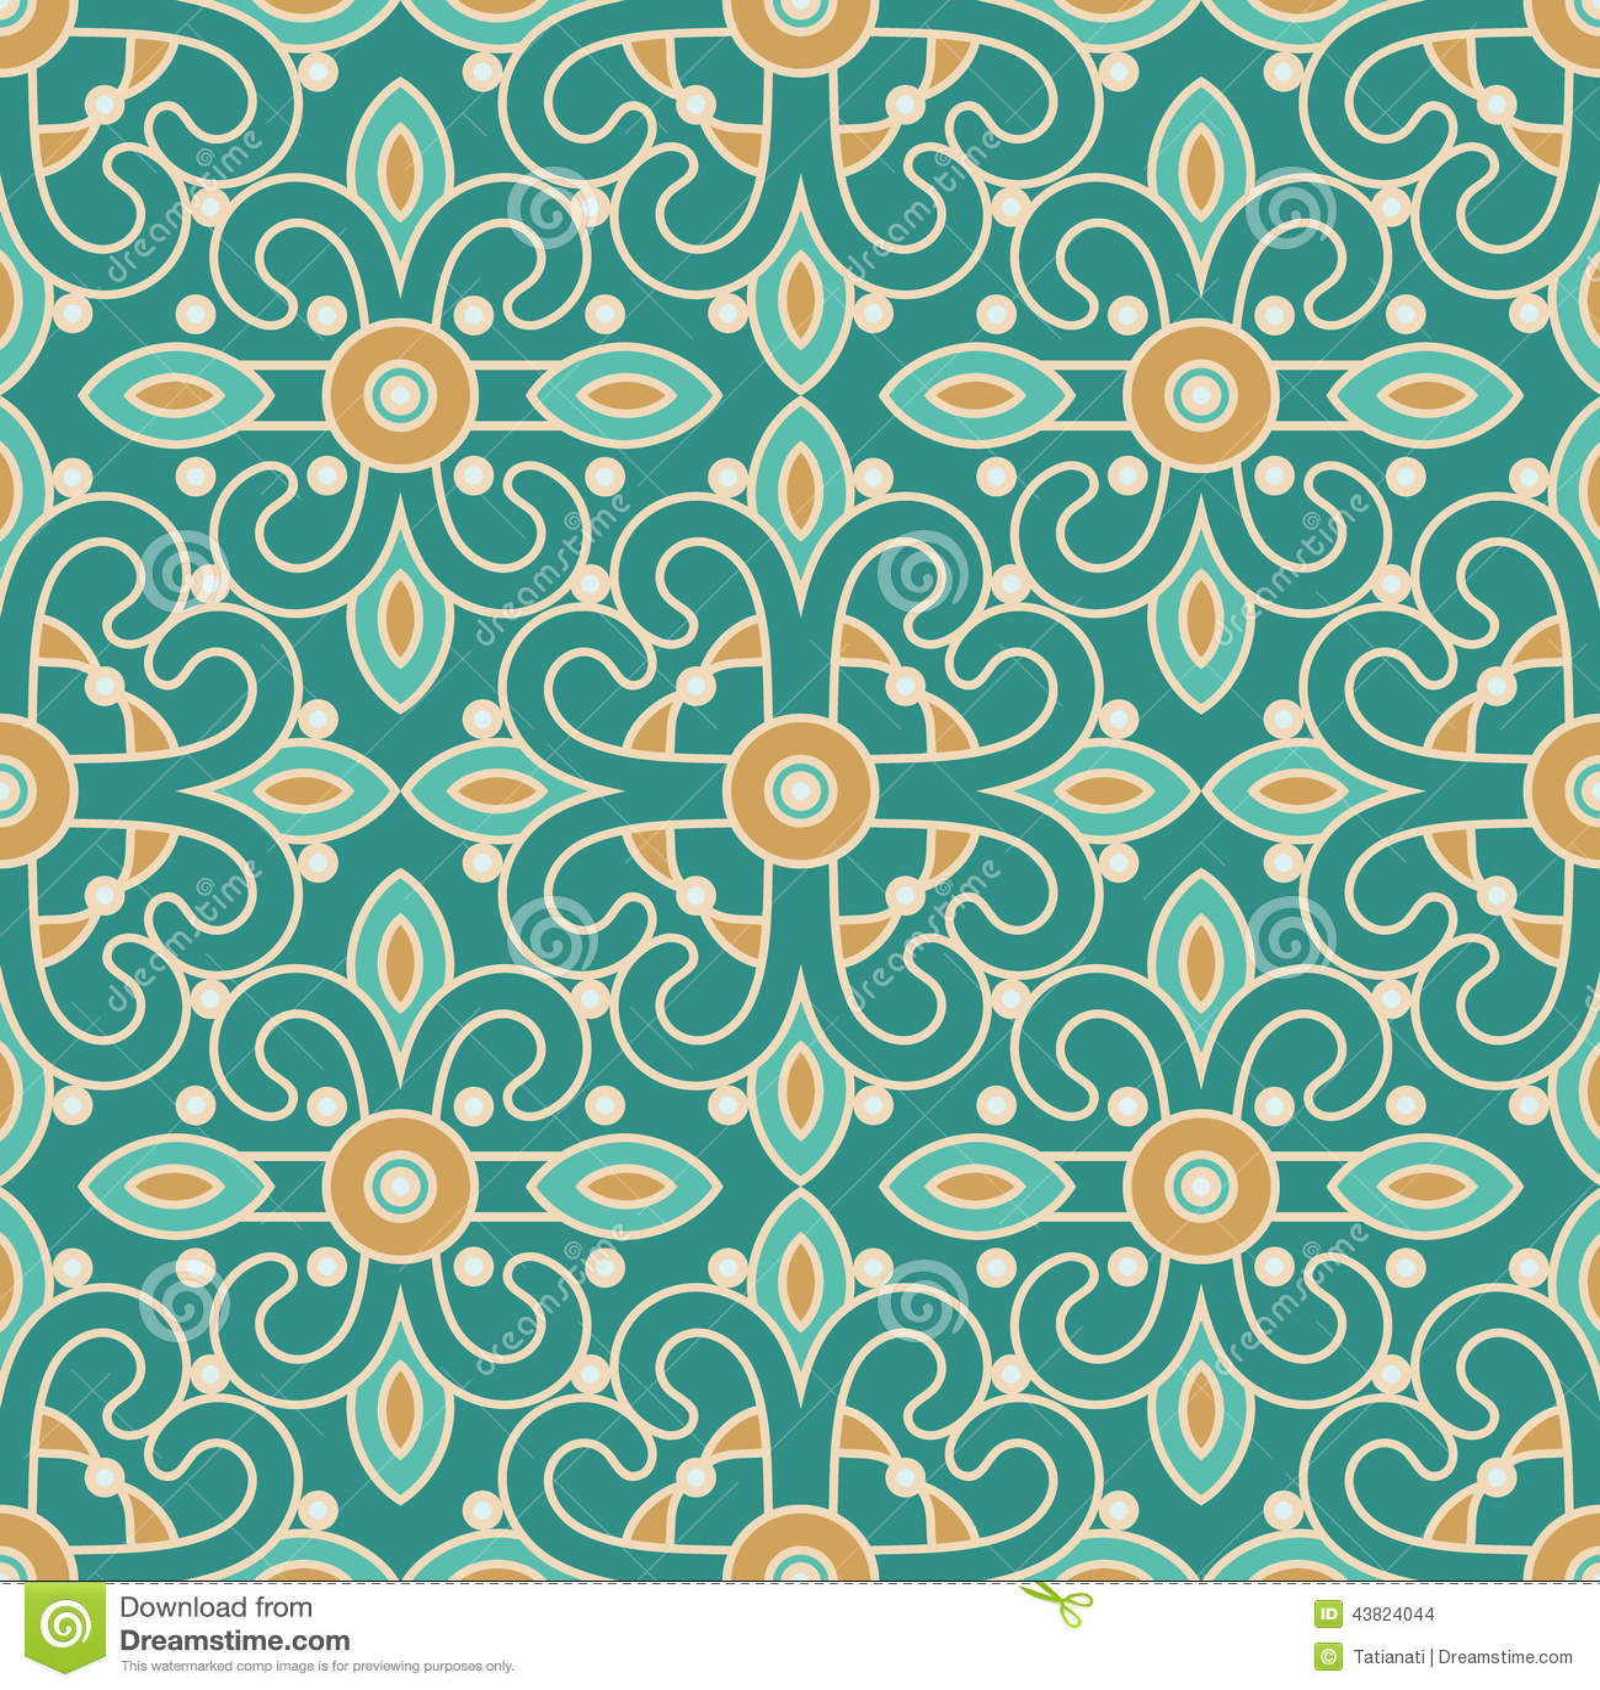 Tile Pattern Stock Vector - Image: 43824044